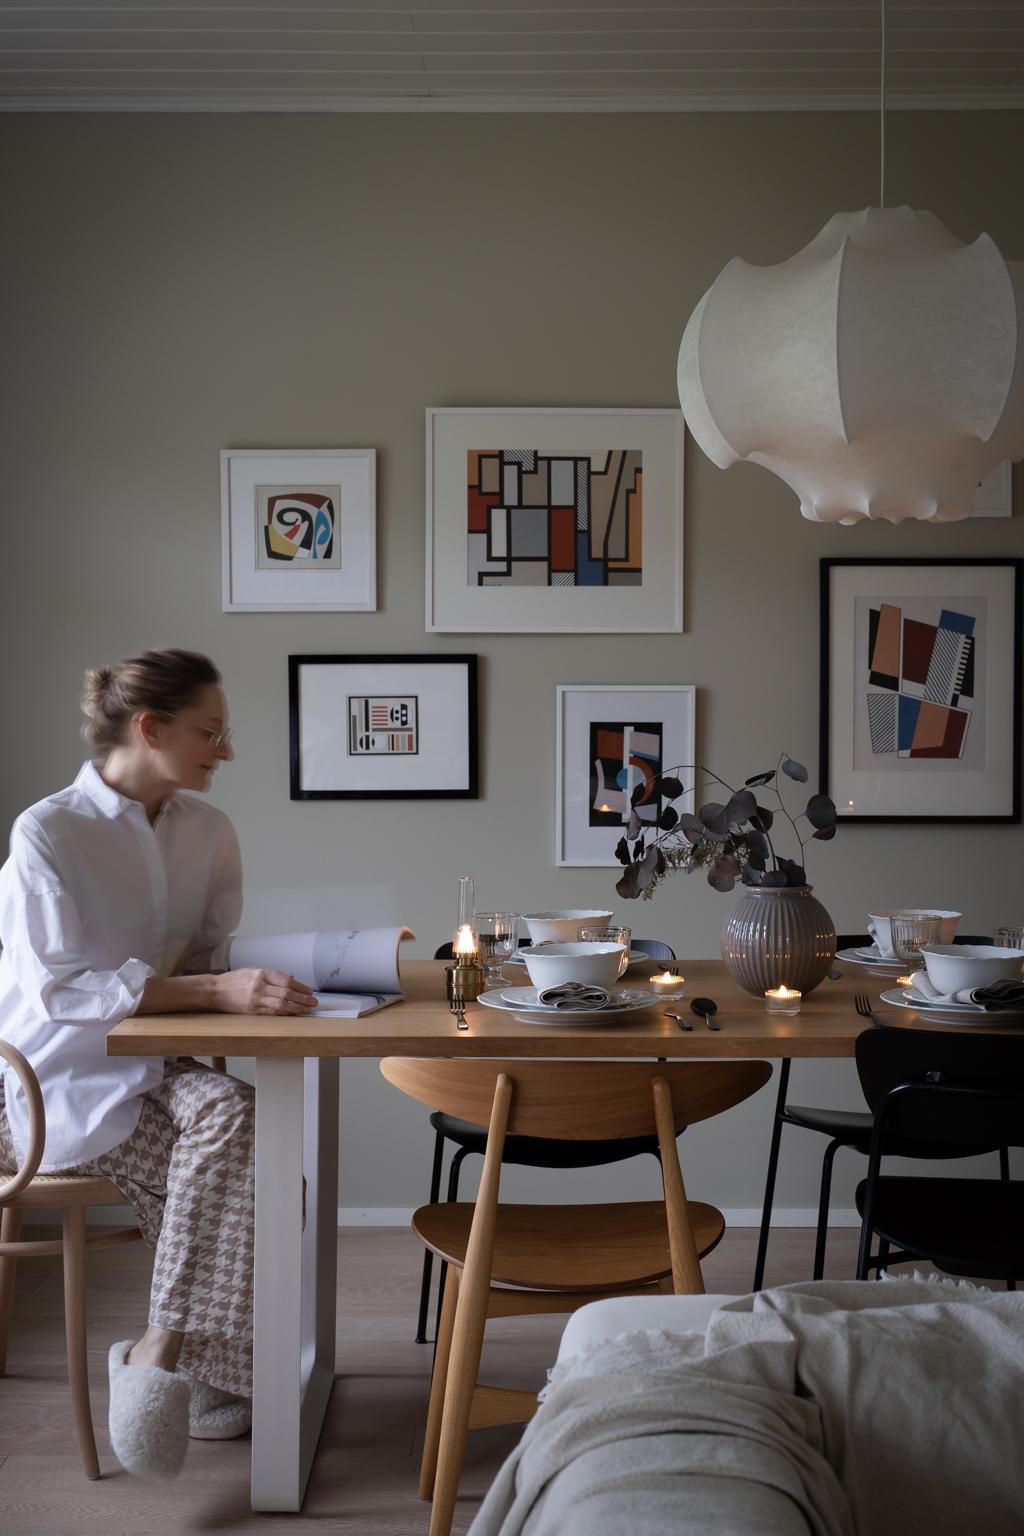 Anne Melender Ikea Joulukattaus 19